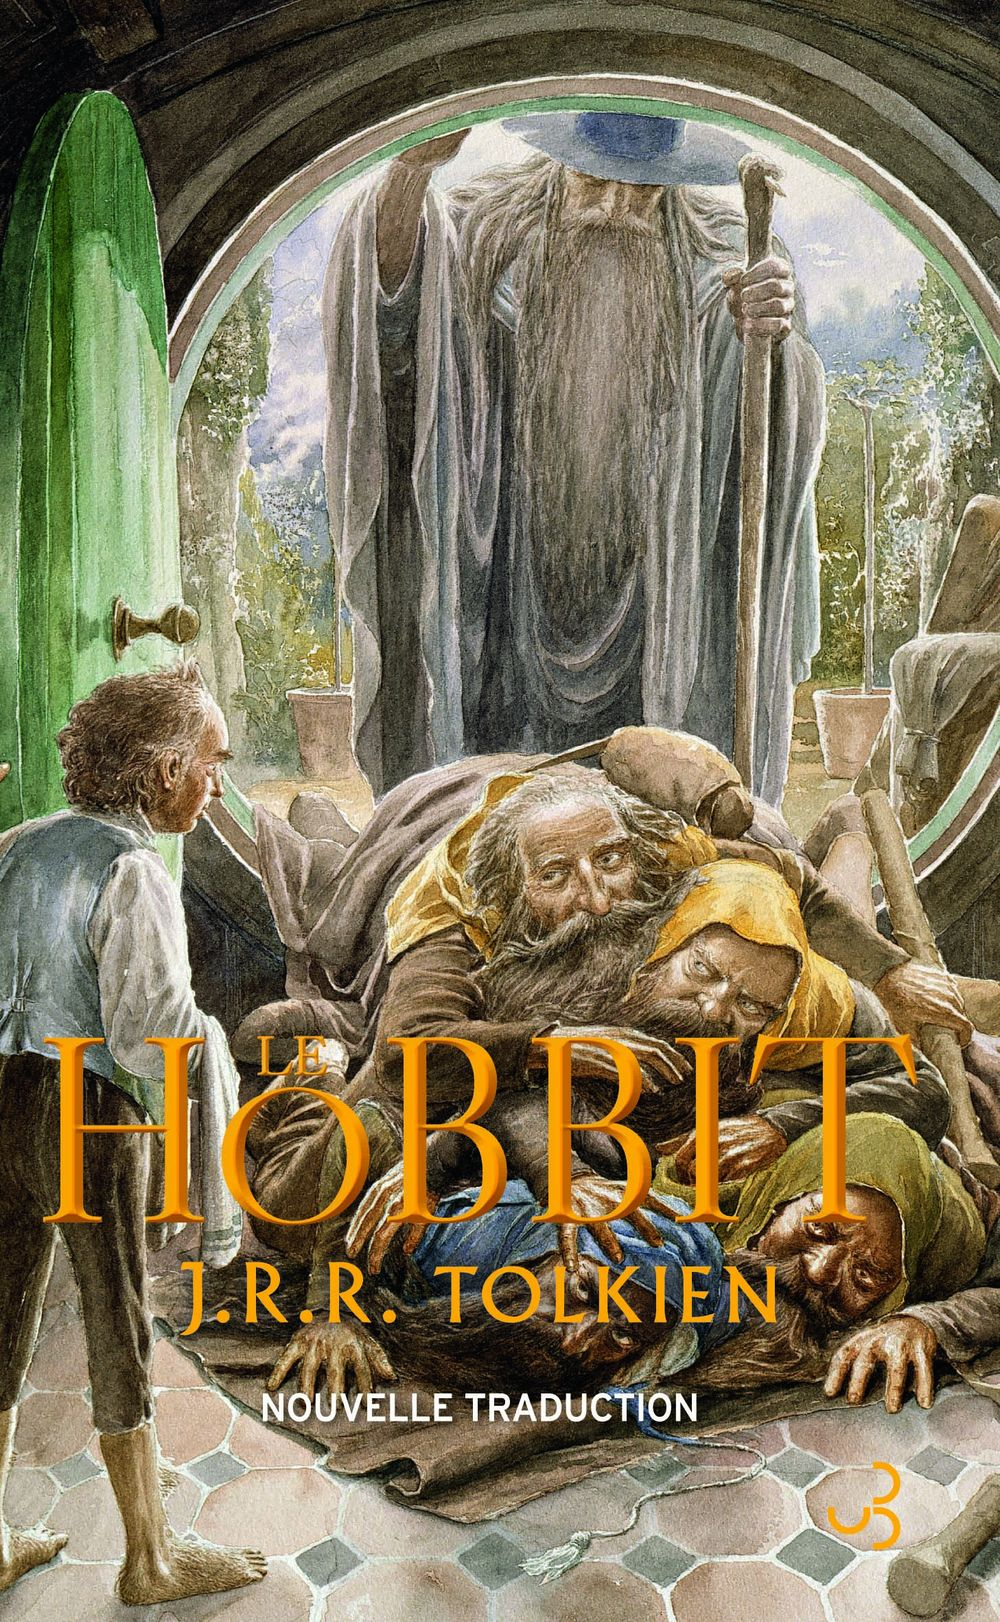 http://www.unificationfrance.com/IMG/jpg/tolkien_-hobbit_broche_nlle-trad_hd.jpg